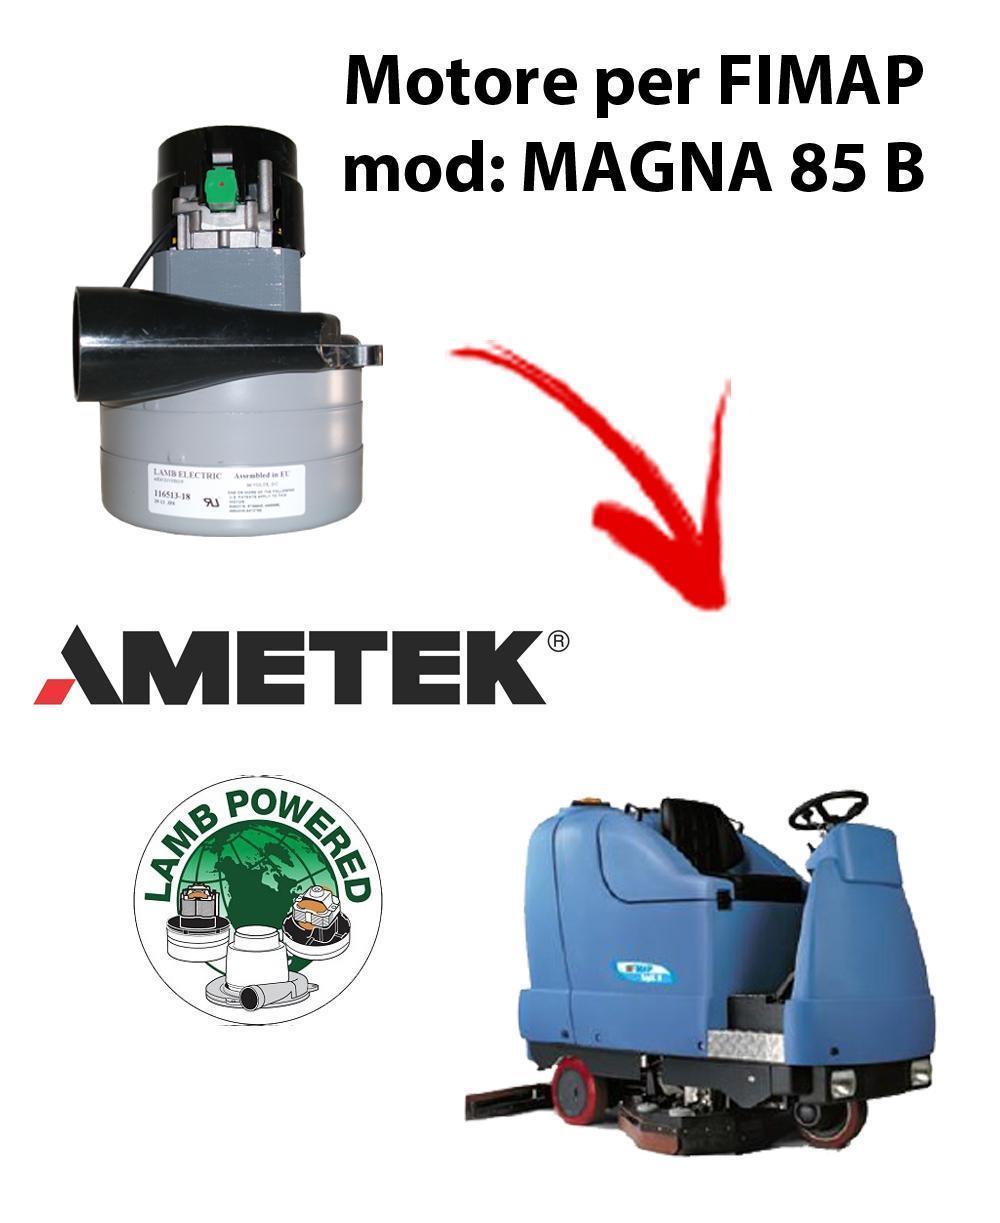 MAGNA 85 B Saugmotor AMETEK für scheuersaugmaschinen FIMAP